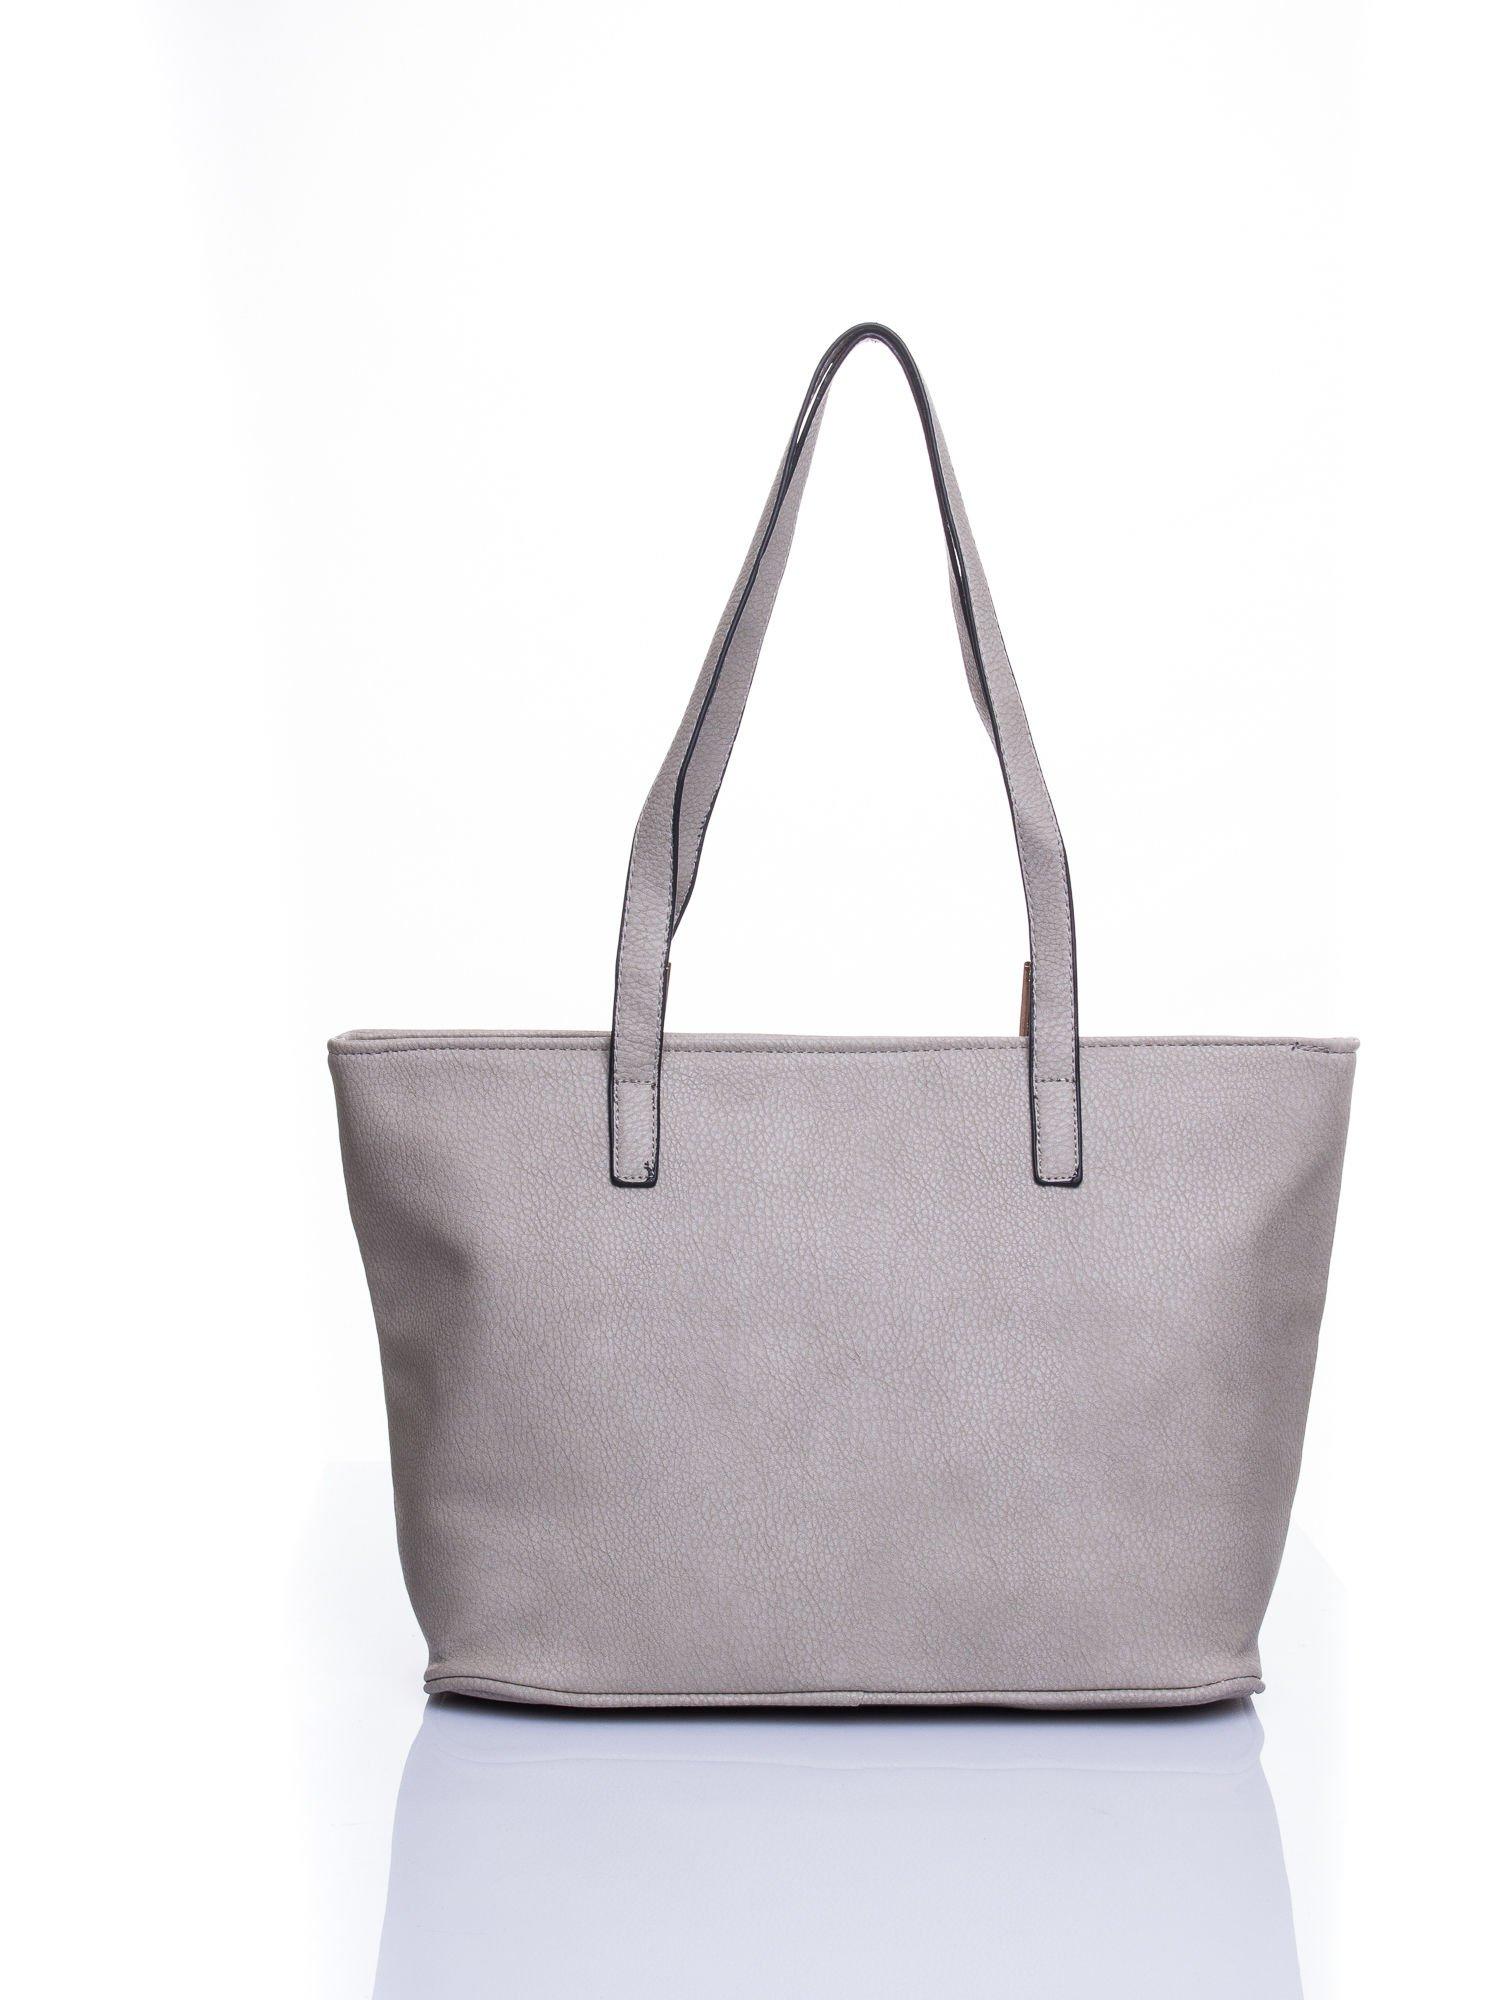 Szara prosta torba shopper bag                                  zdj.                                  3